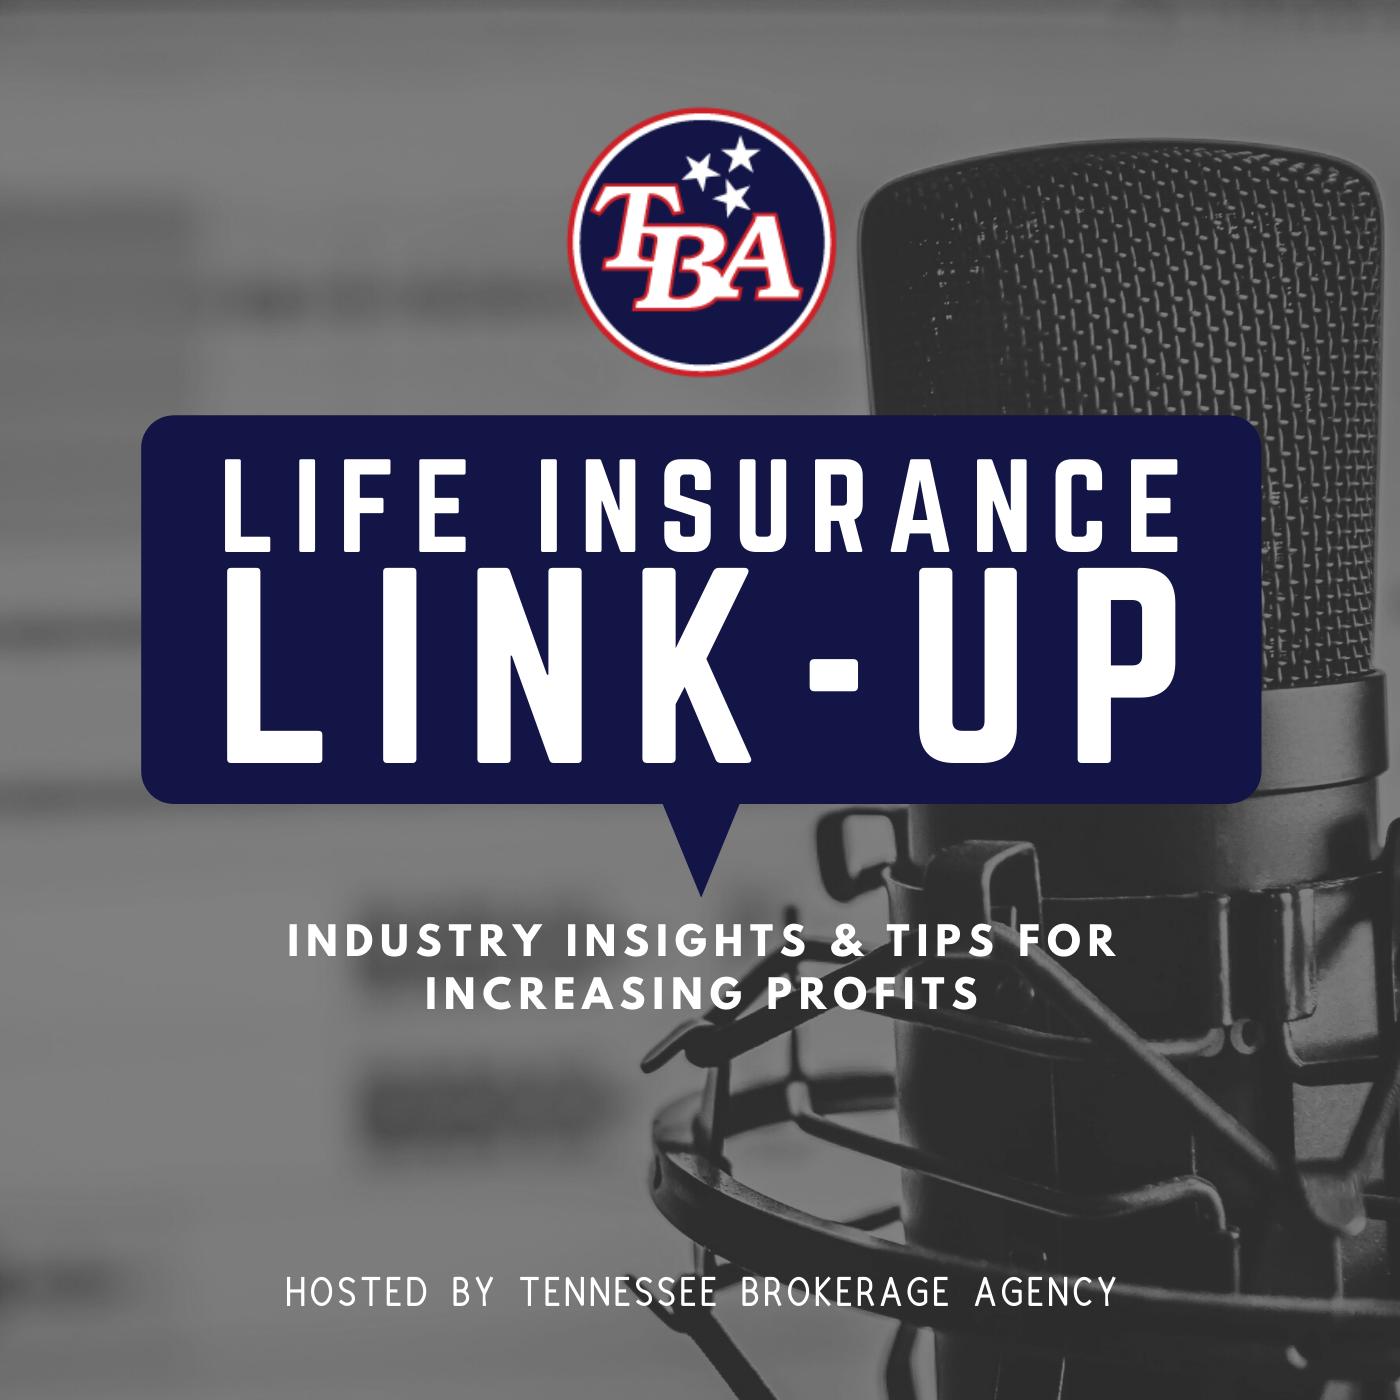 TBA's Life Insurance Link Up show art